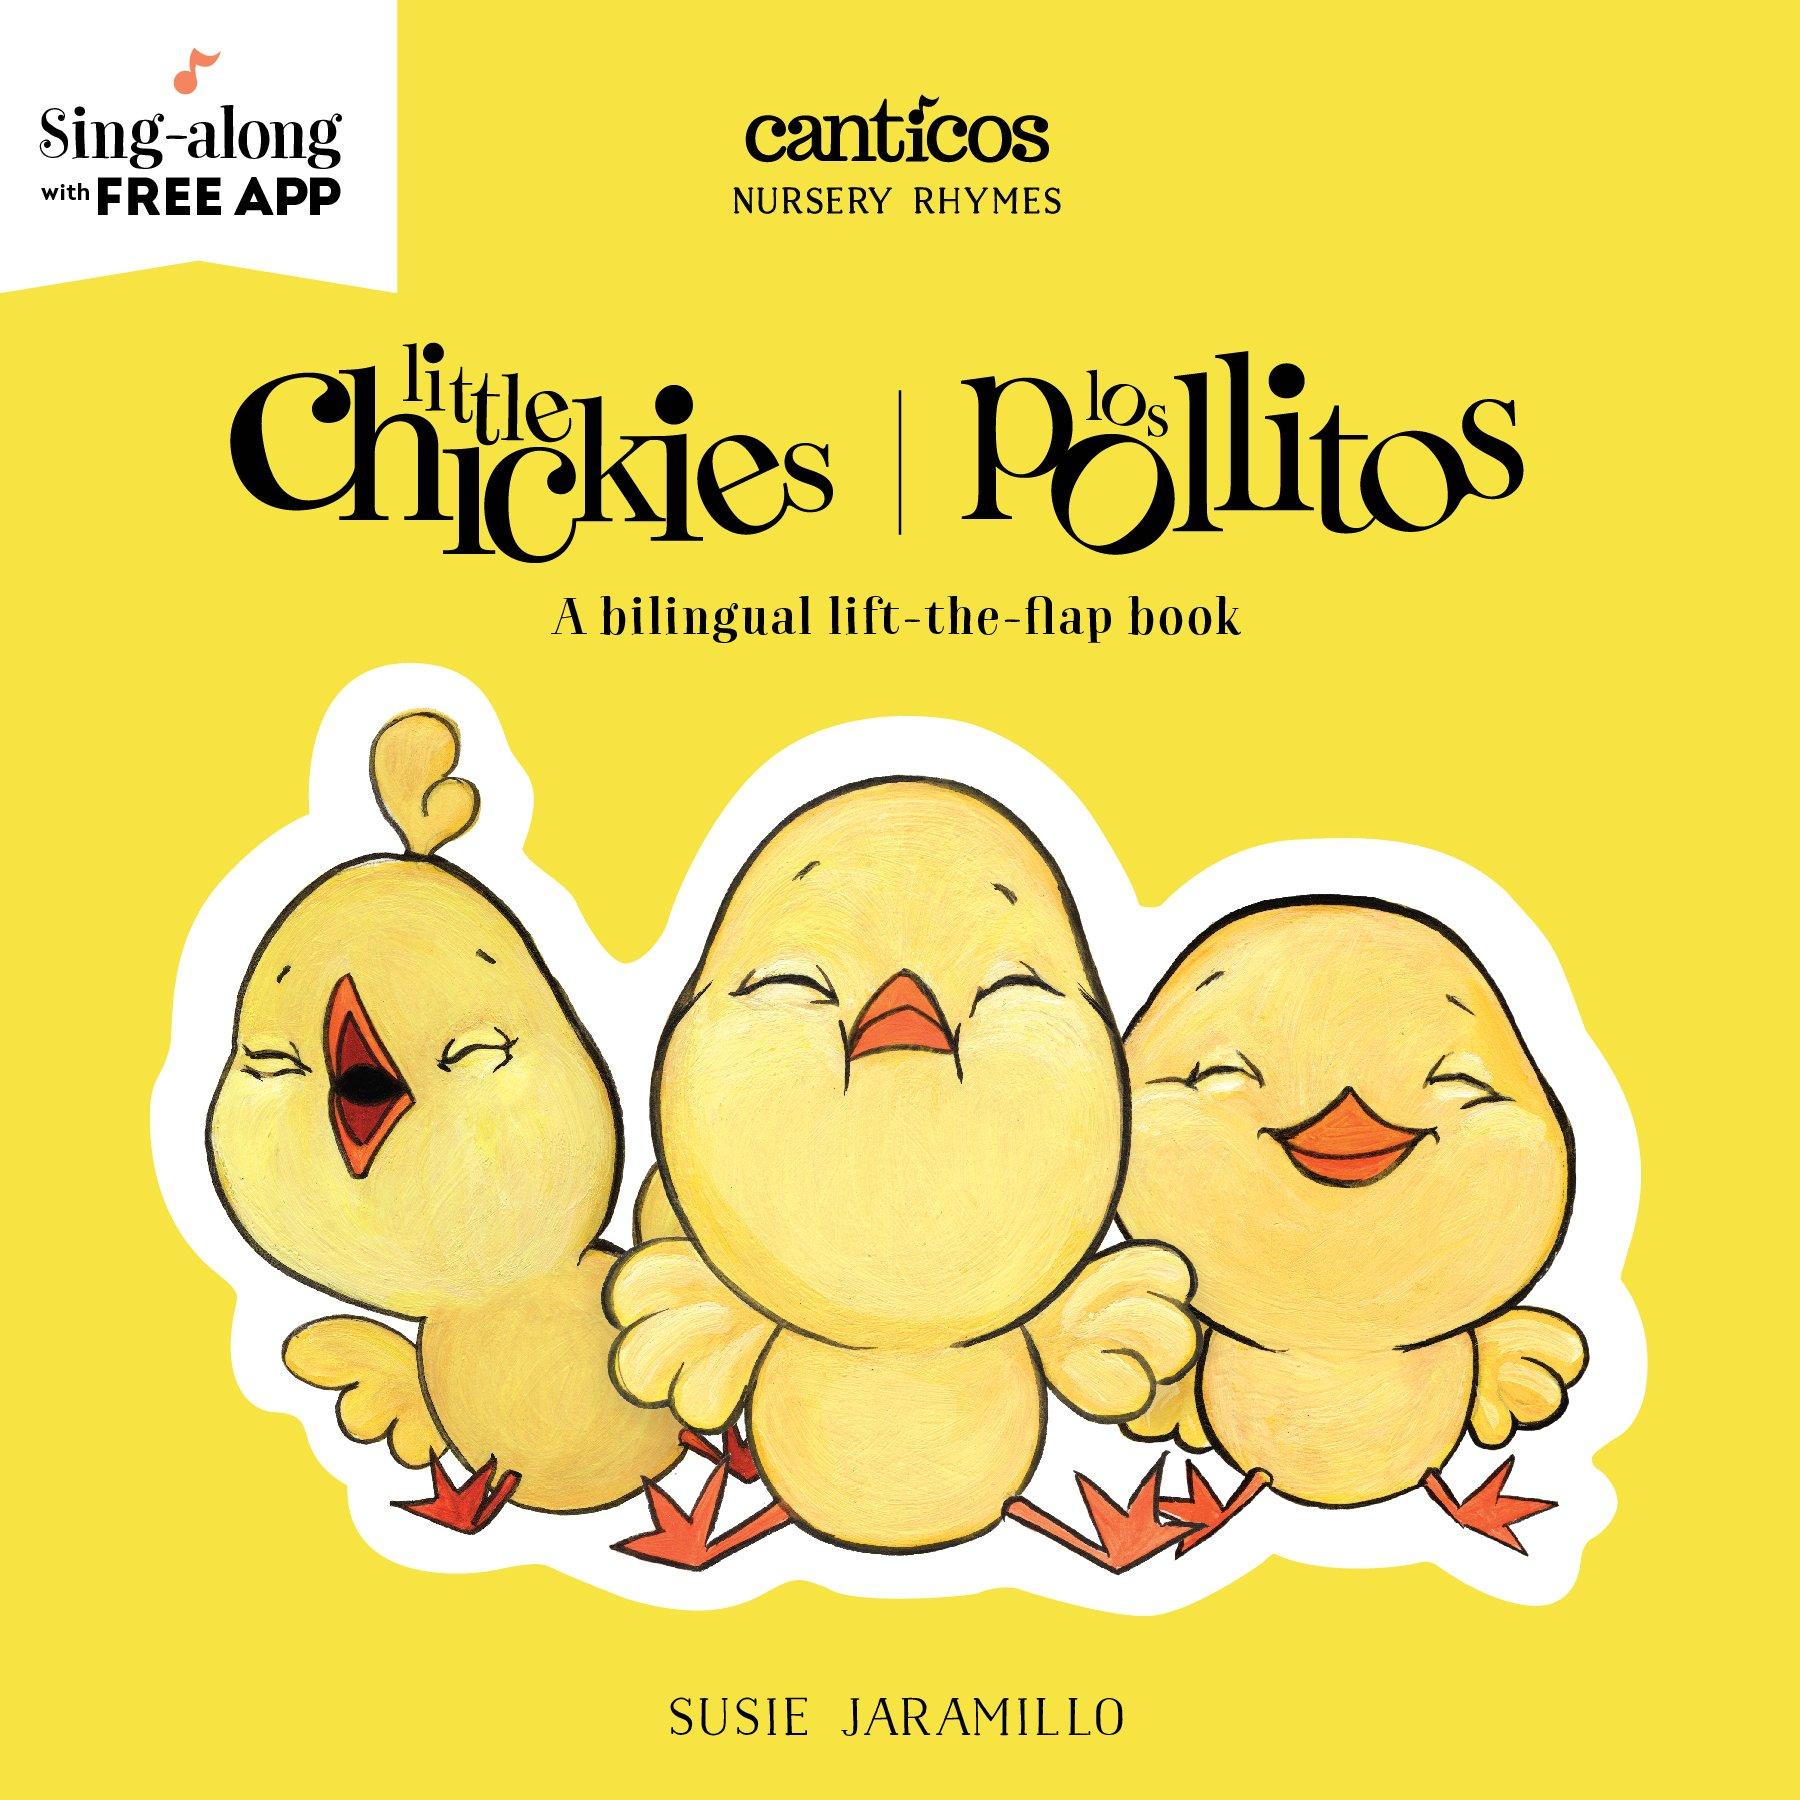 Little Chickies/Los Pollitos (Canticos)